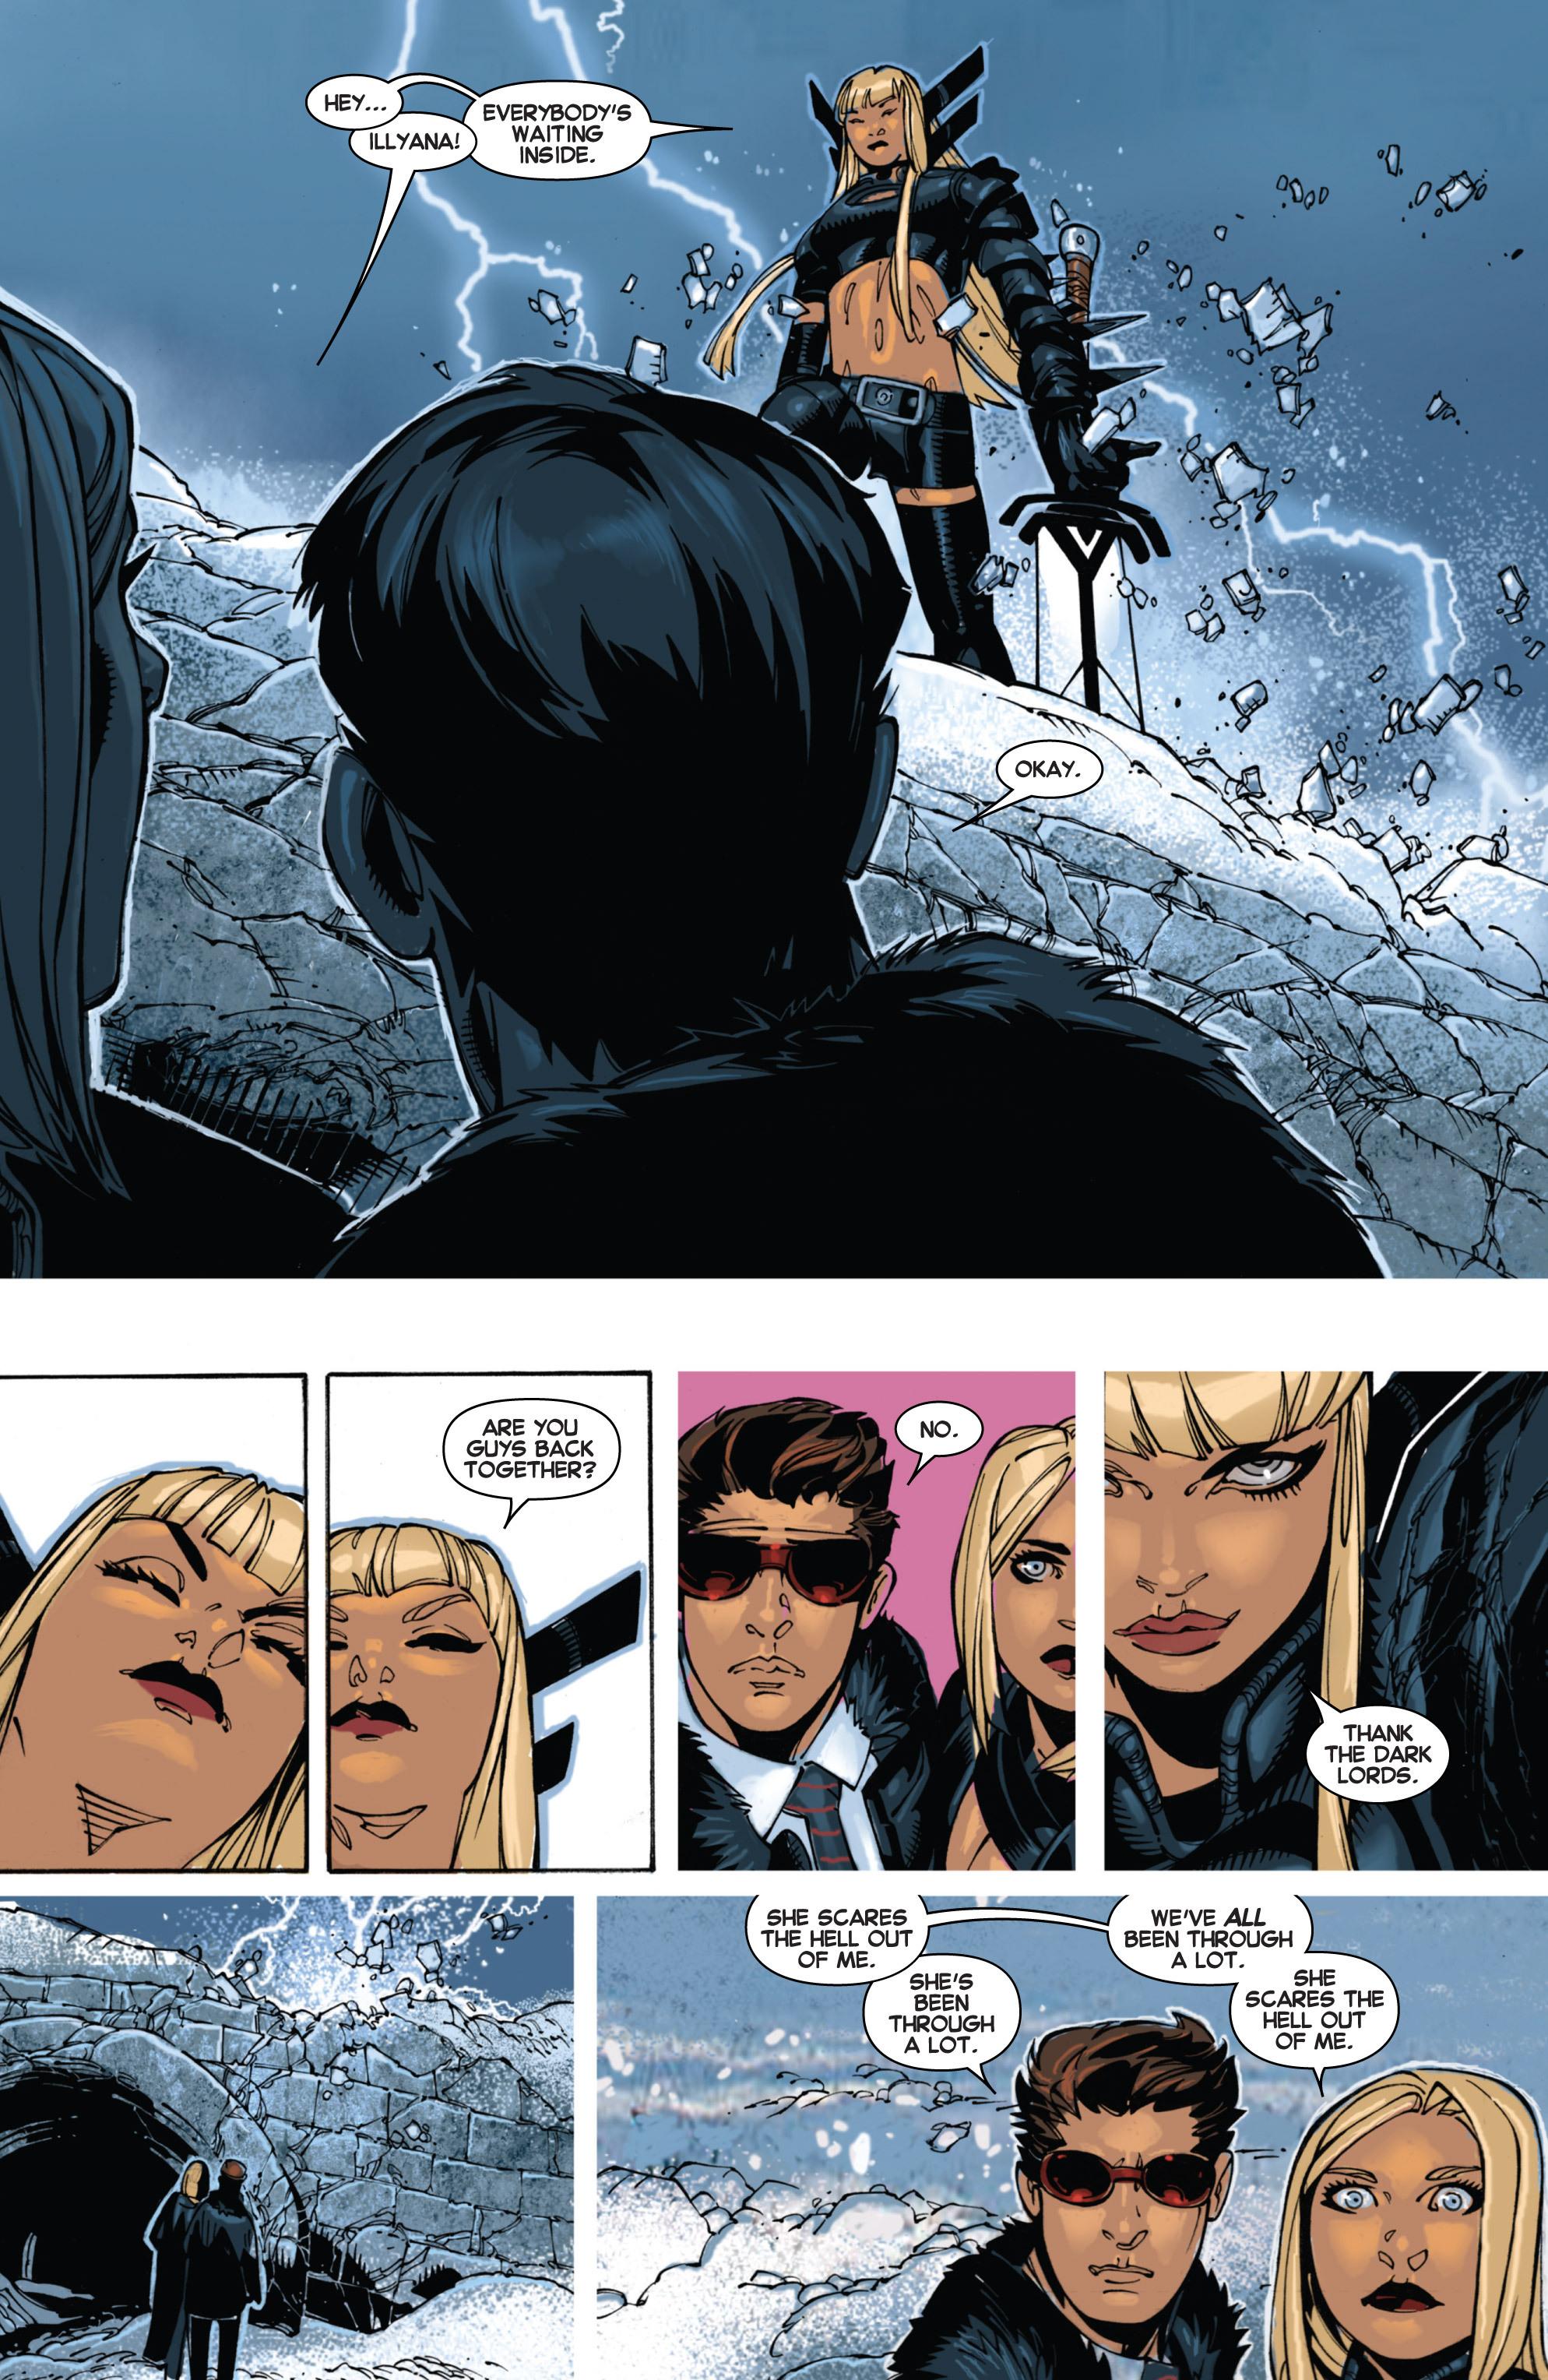 Read online Uncanny X-Men (2013) comic -  Issue # _TPB 1 - Revolution - 32